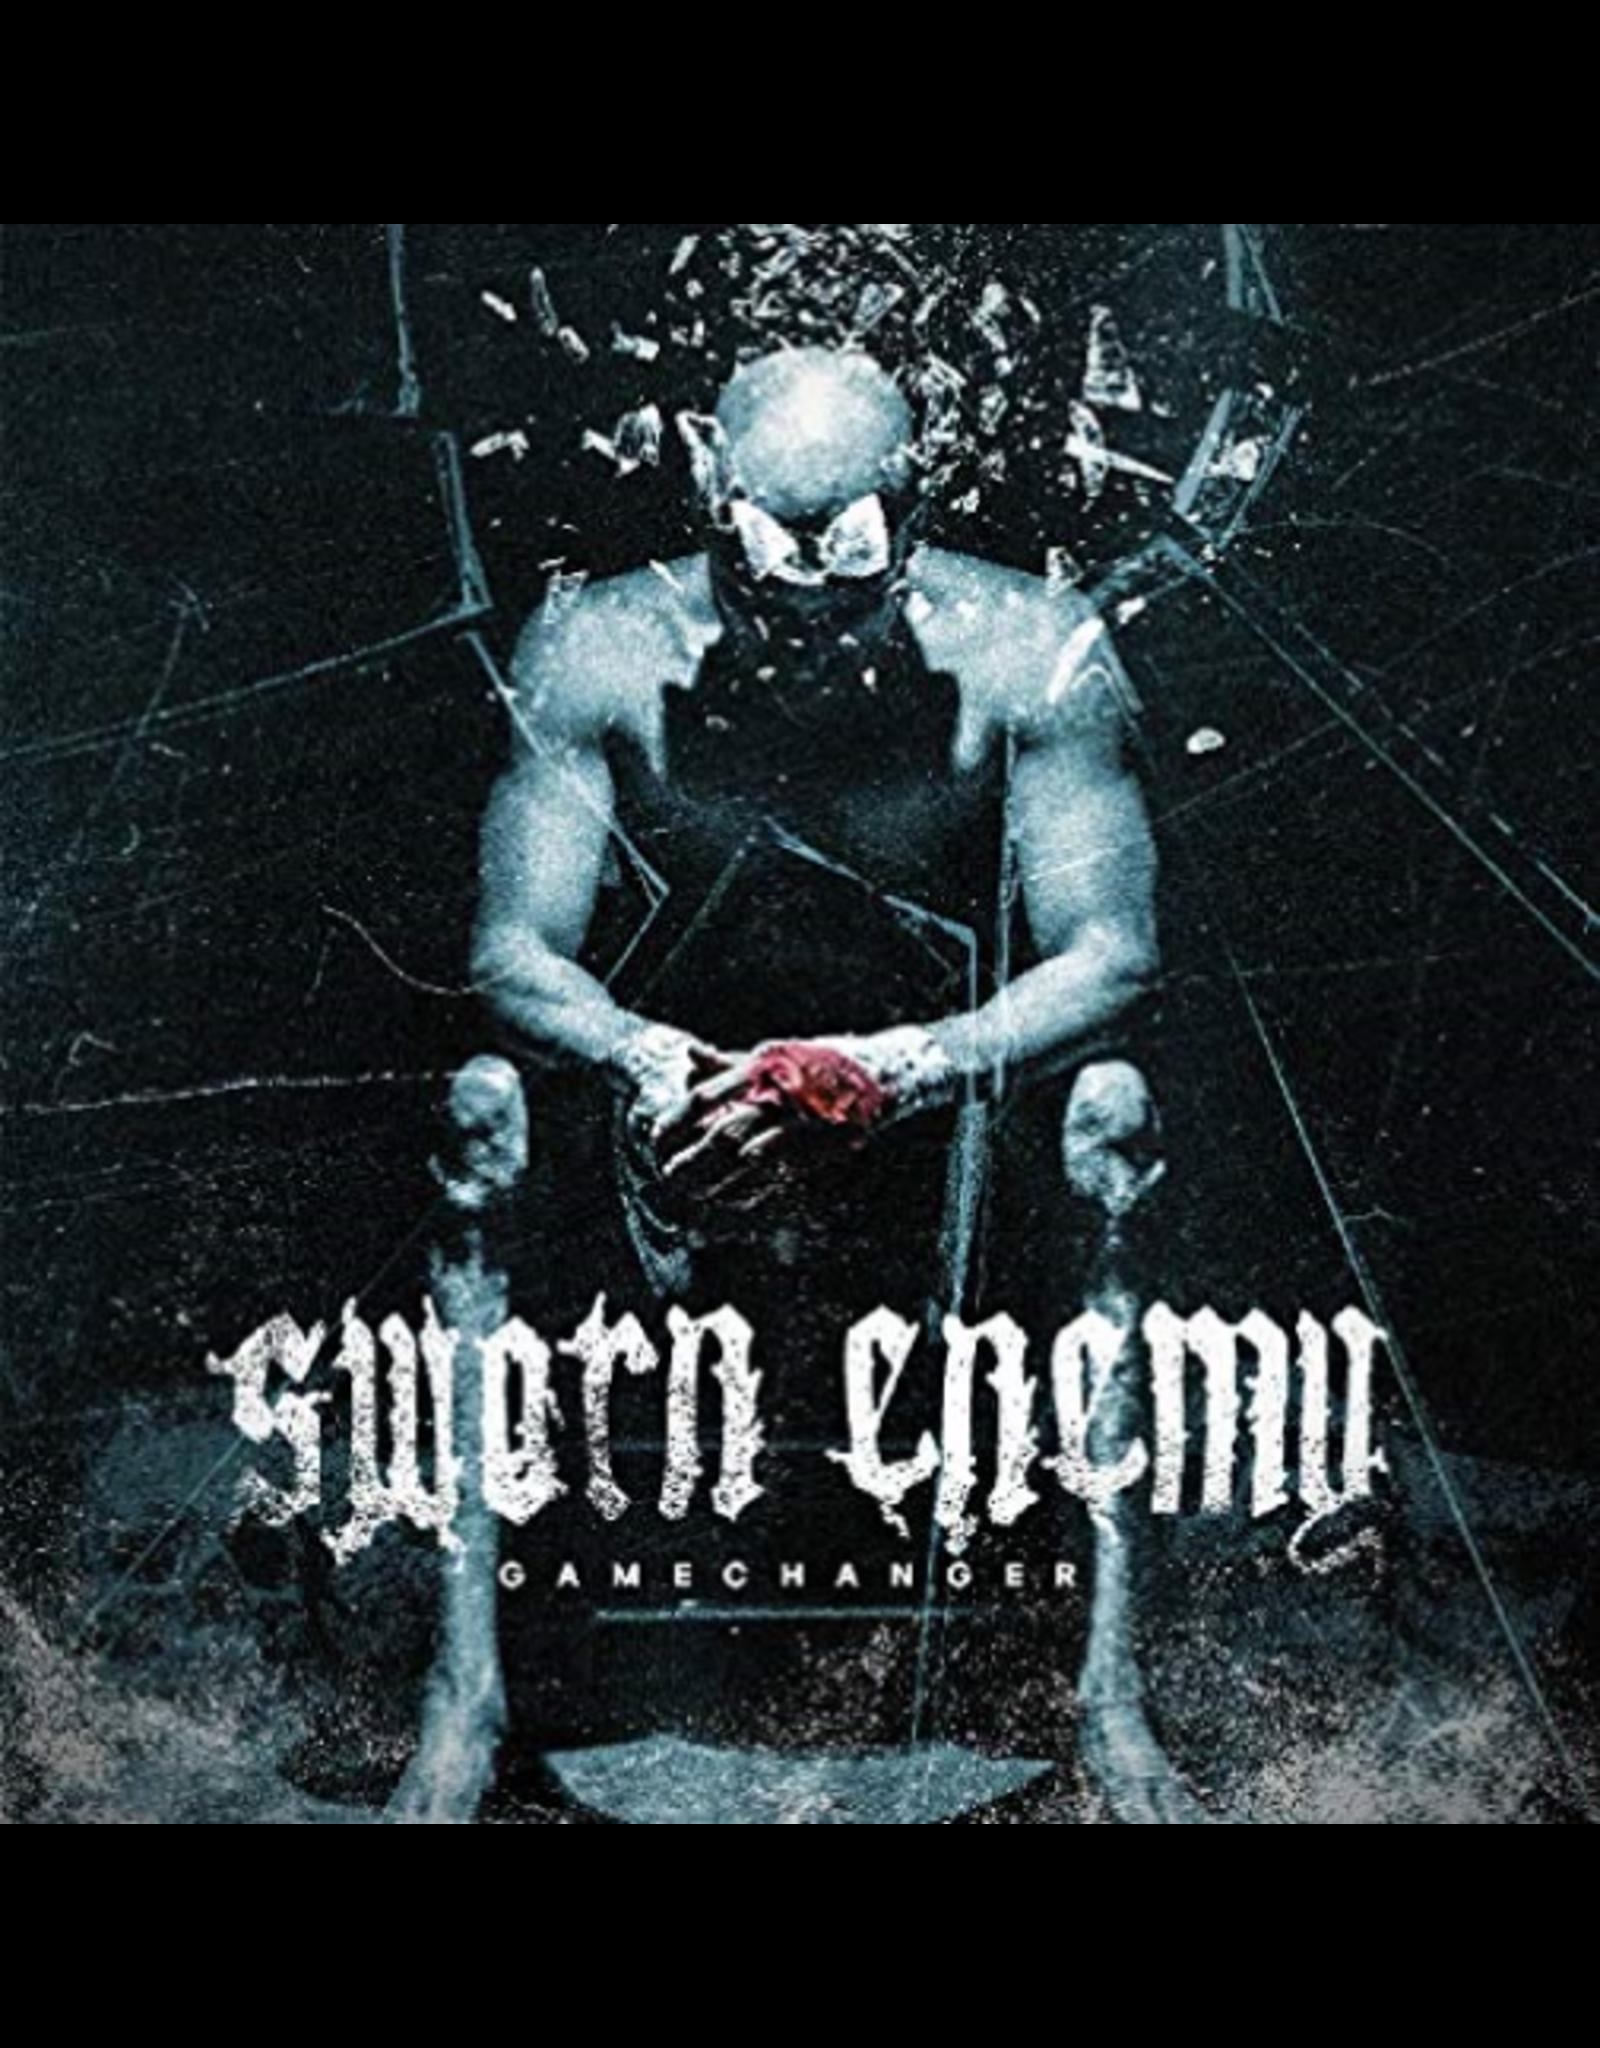 Sworn Enemy - Gamechanger LP (blue-splatter)